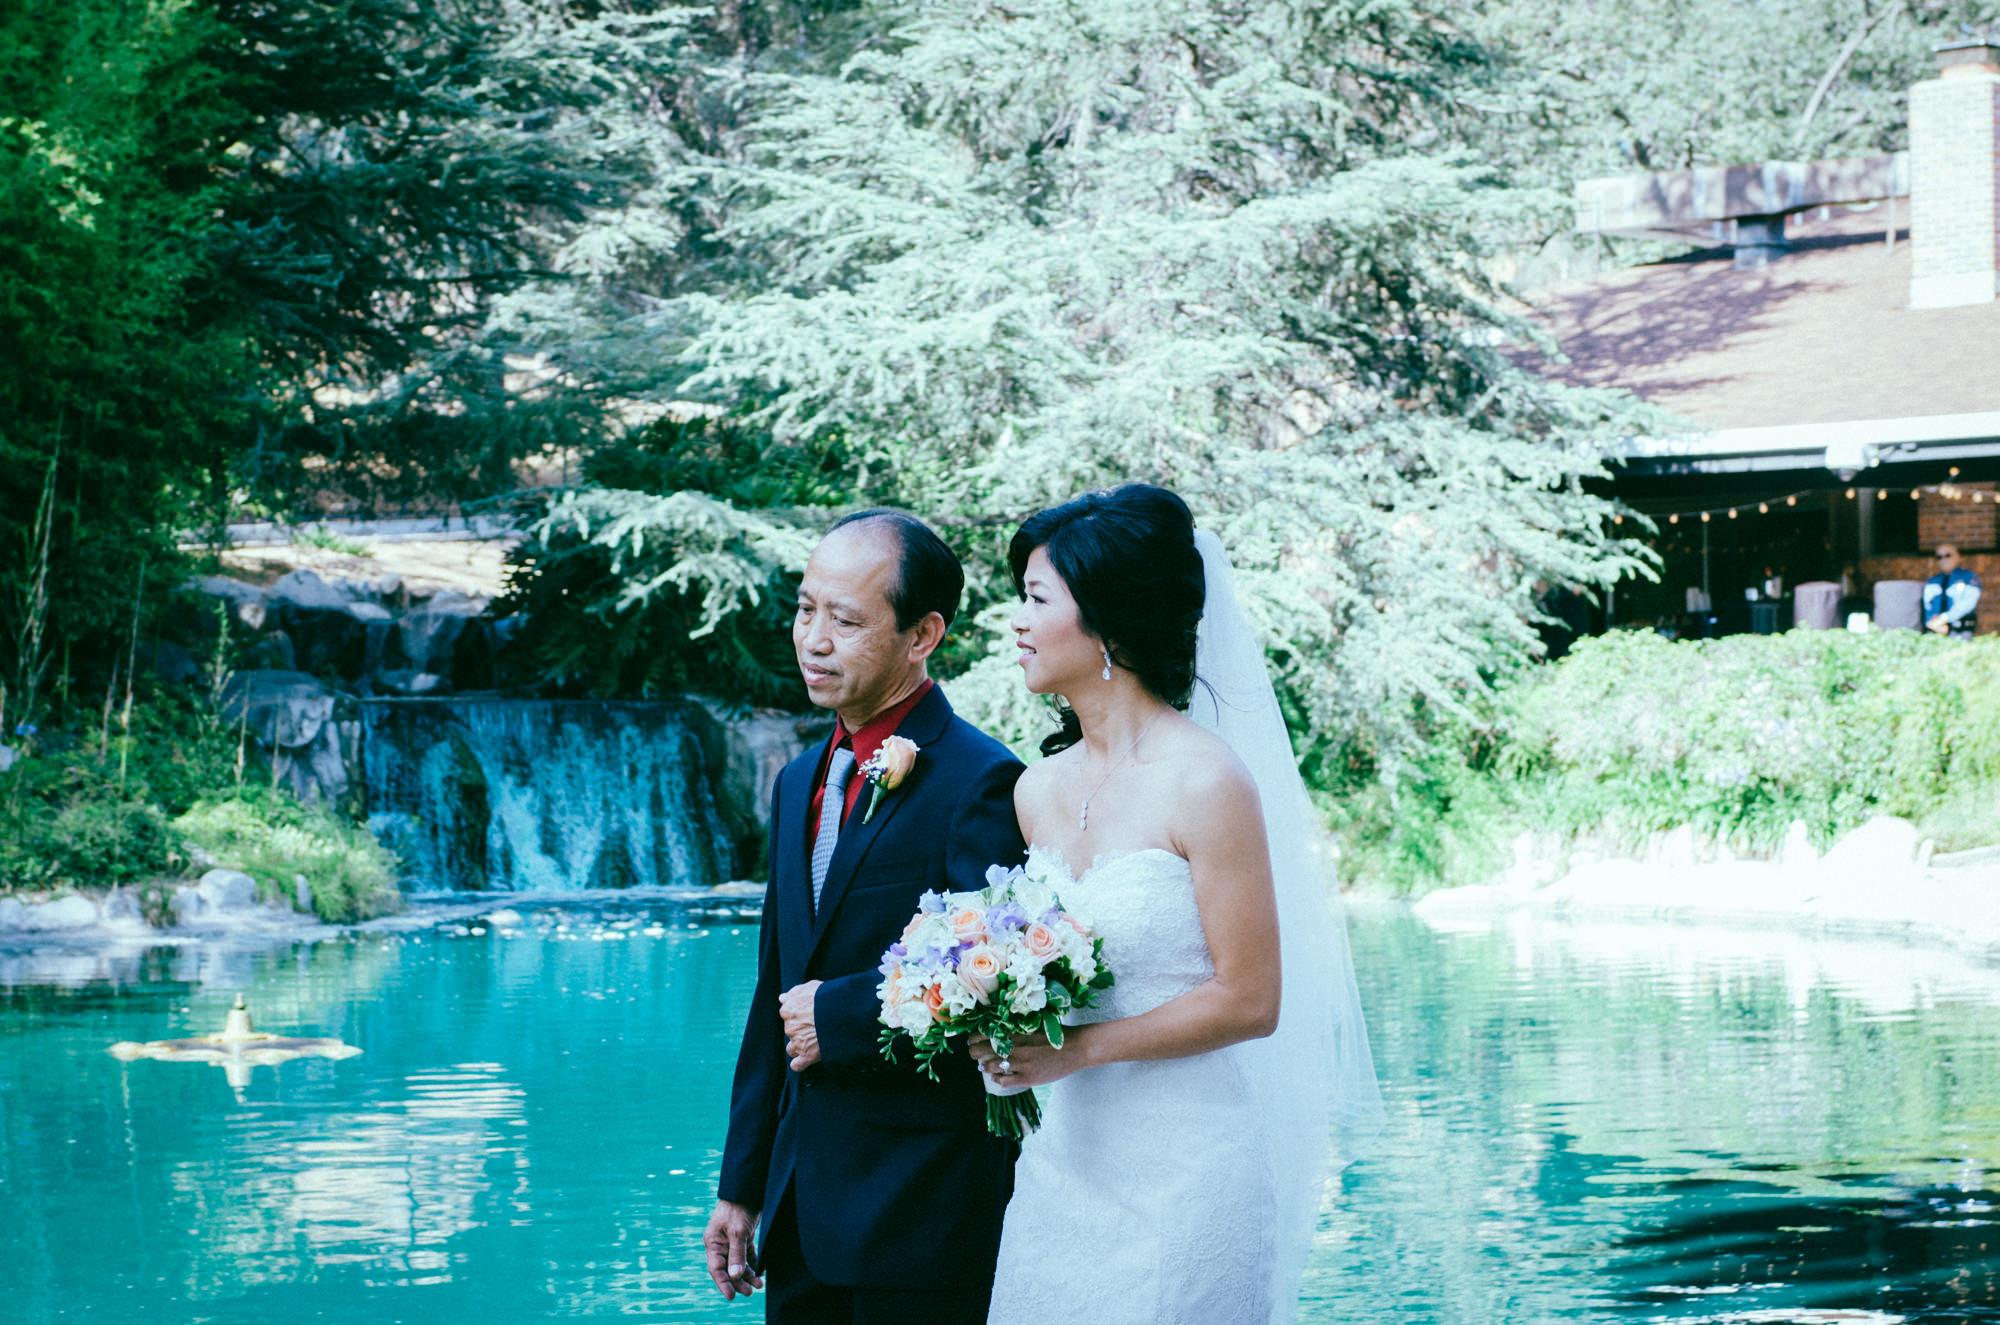 Alice_&_Aaron_Wedding_by_The_Light_&_Glass_Photography-059.jpg